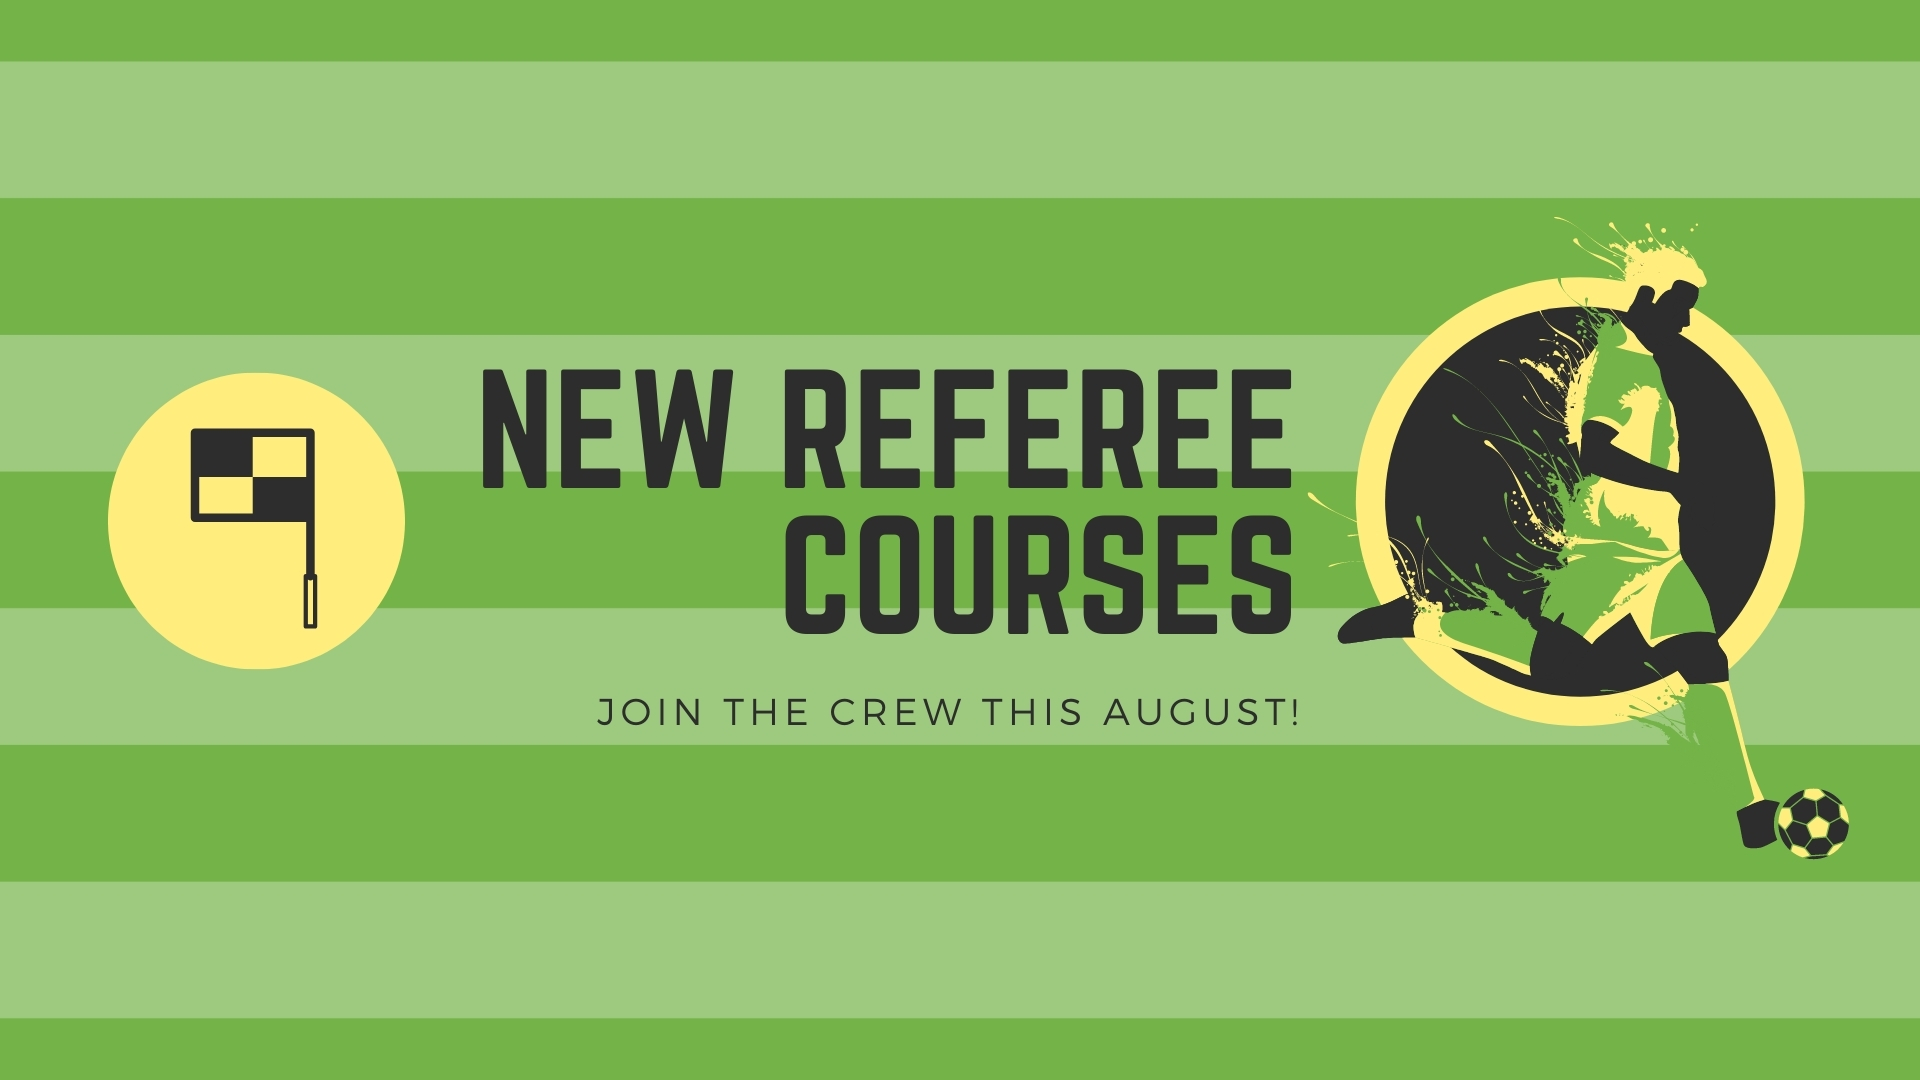 1920x1080 New Referee Courses